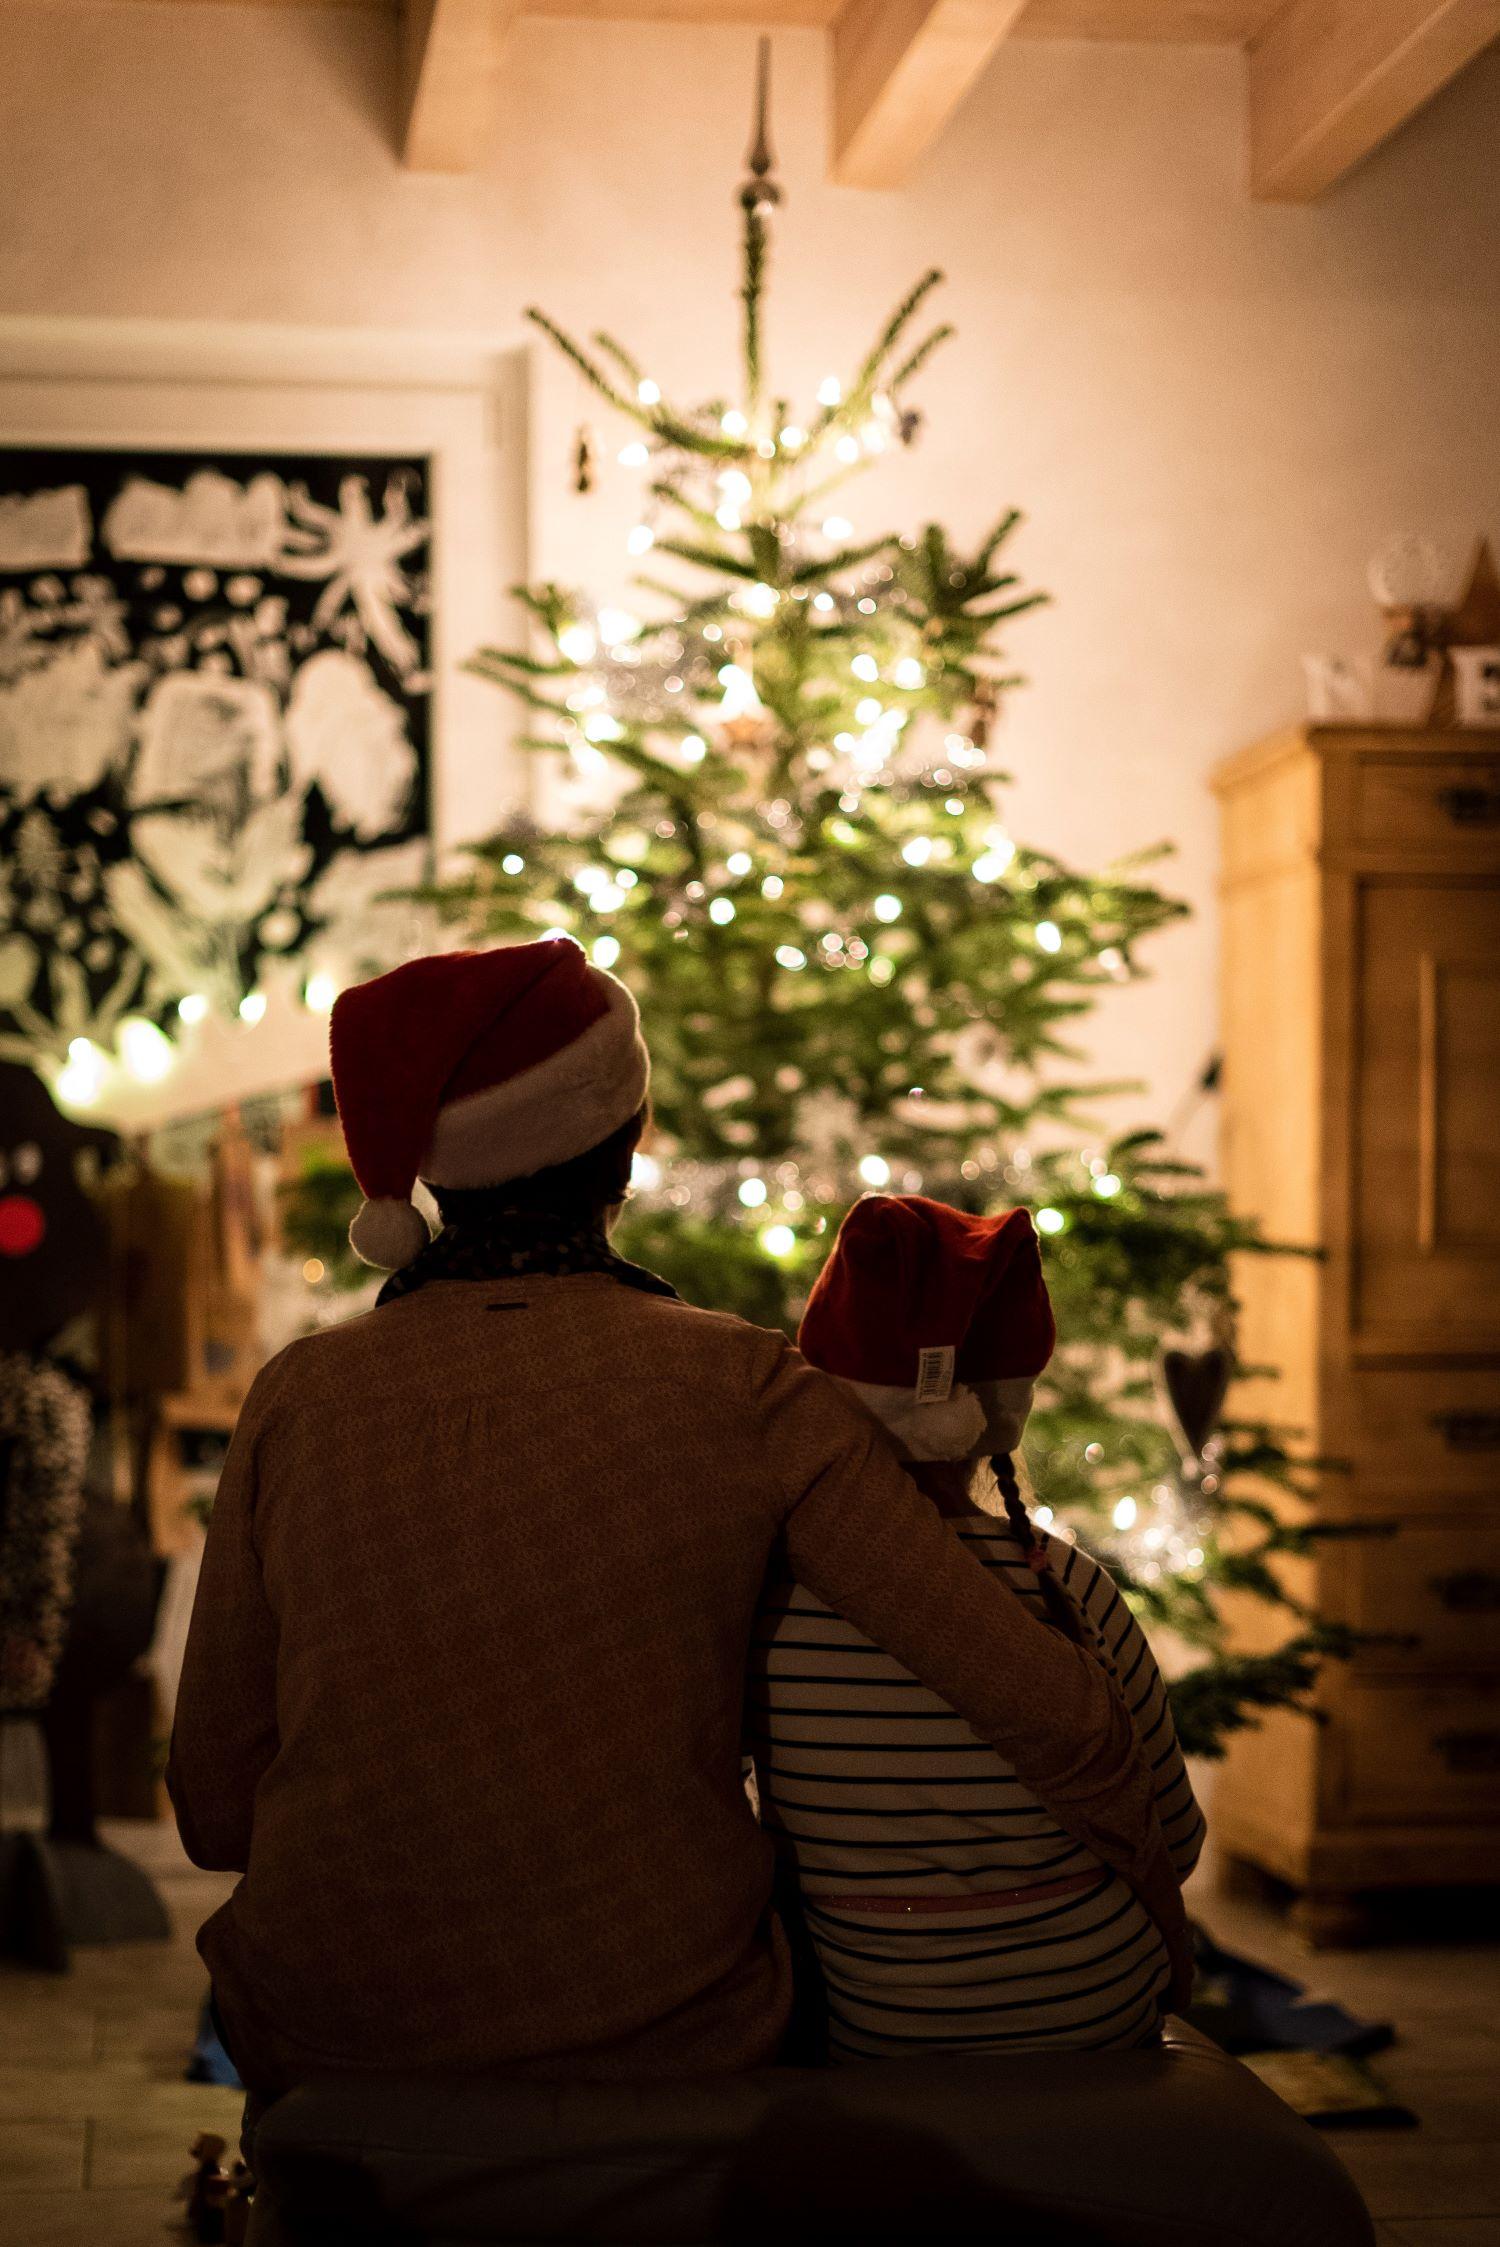 HOPE brings five holiday spending tips